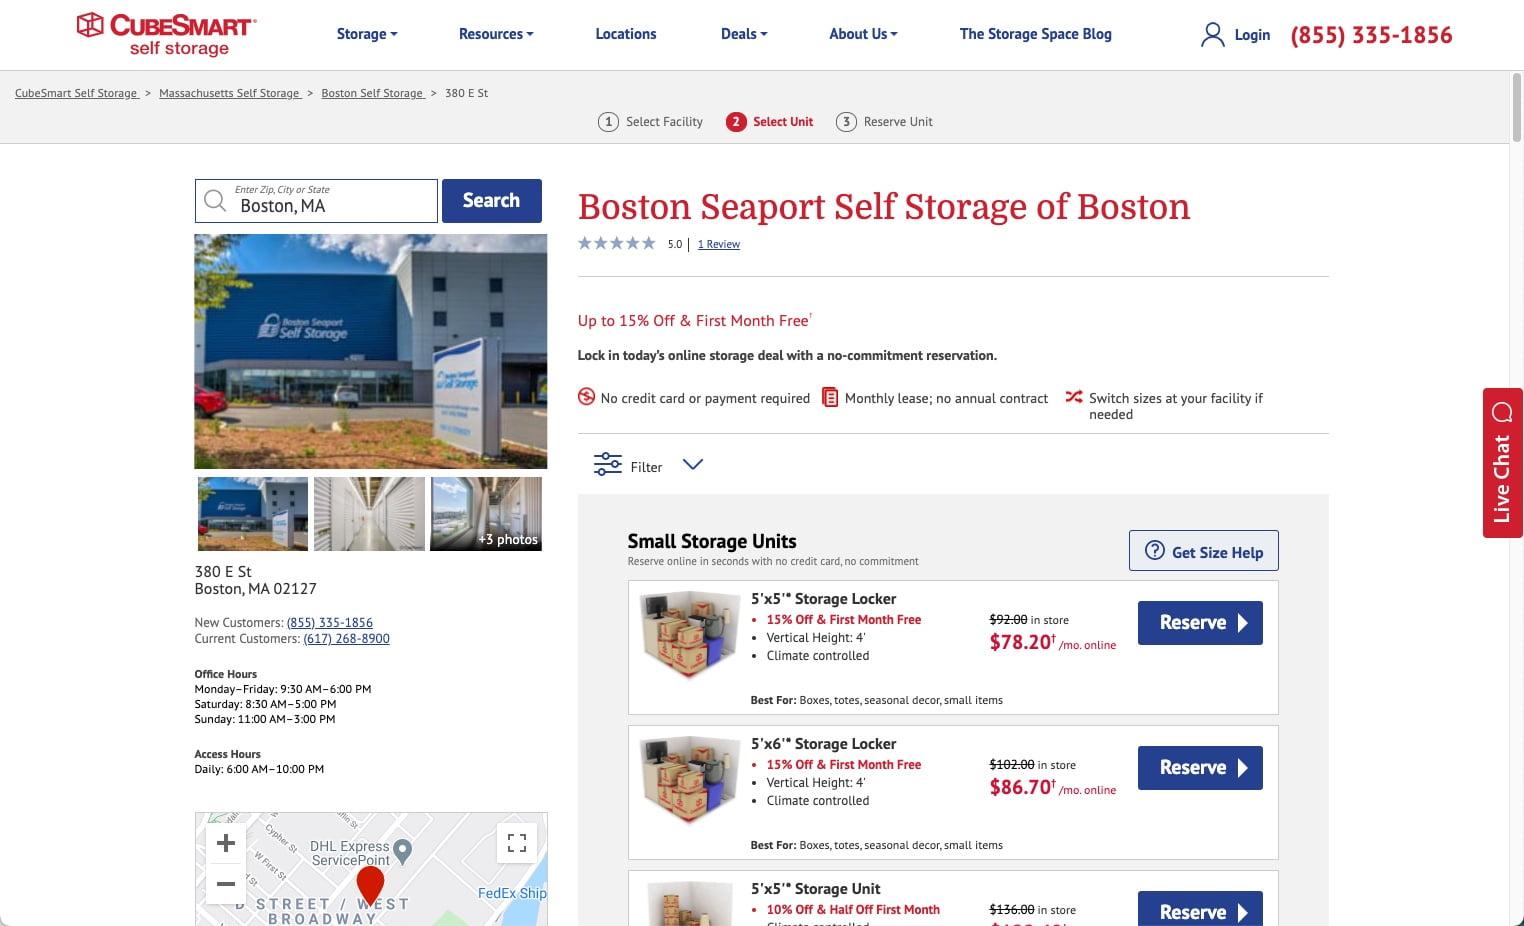 Boston Seaport Self Storage of Boston